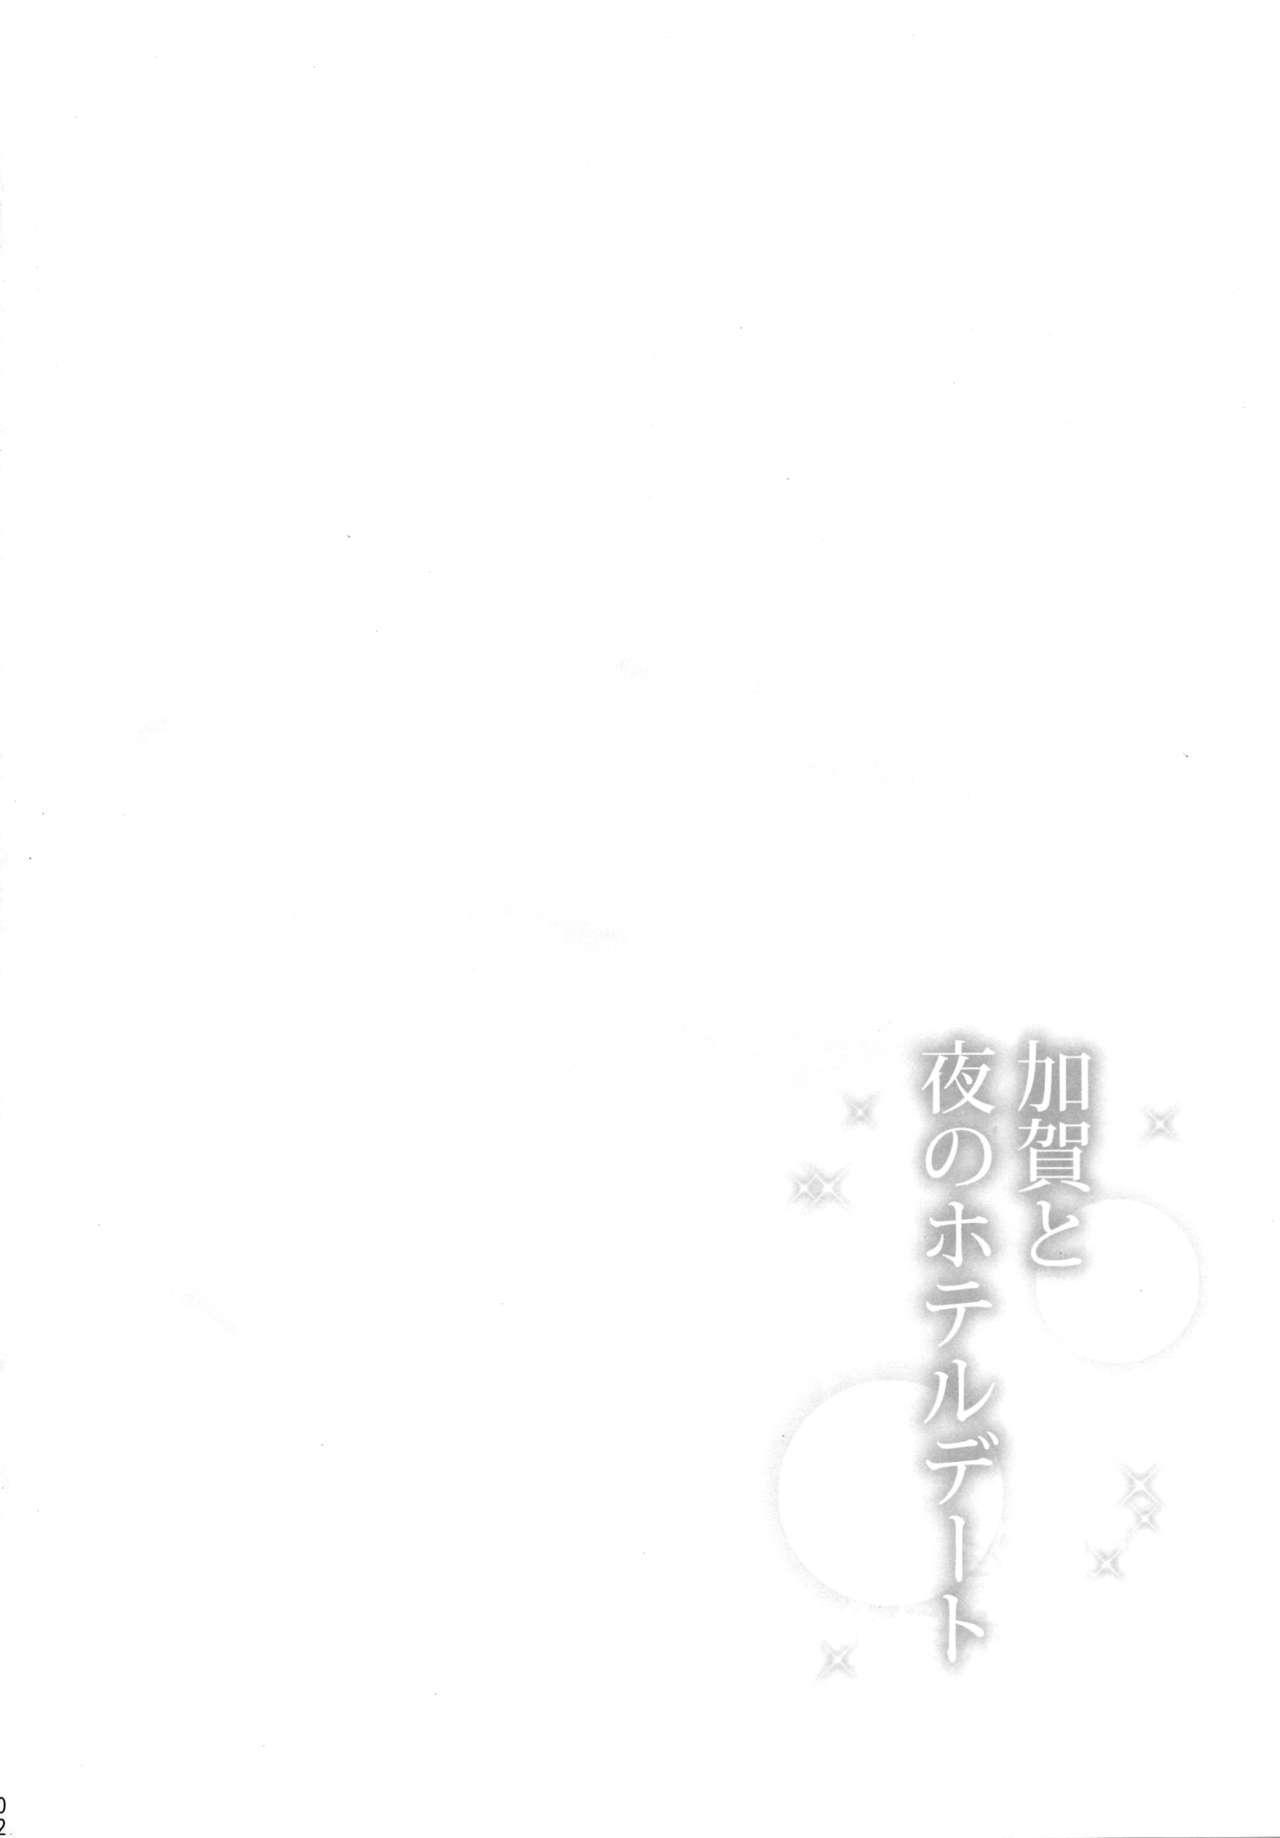 Kaga to Yoru no Hotel Date | An Overnight Hotel Date With Kaga 2